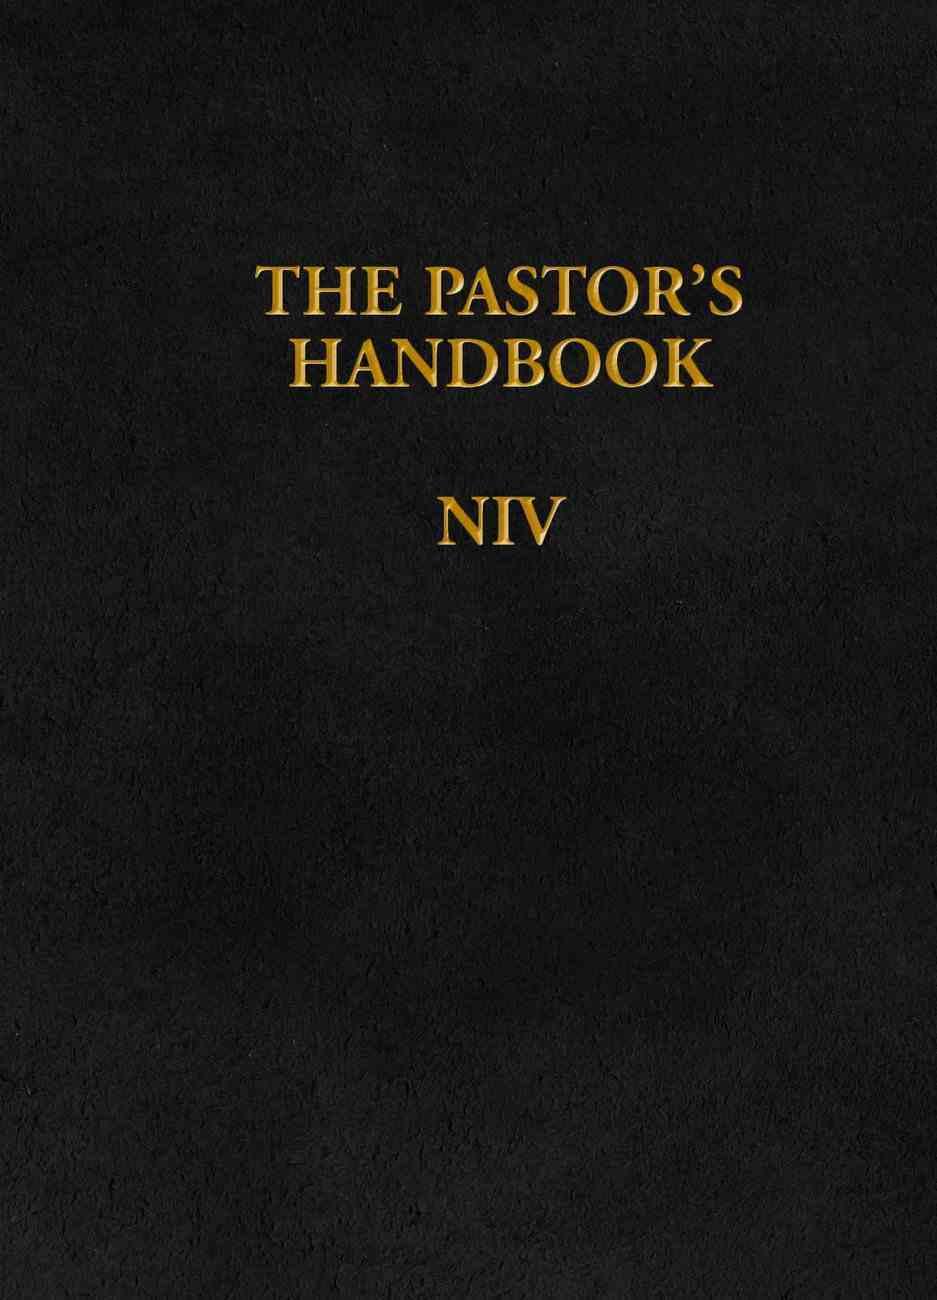 The Pastor's Handbook (Niv) Hardback